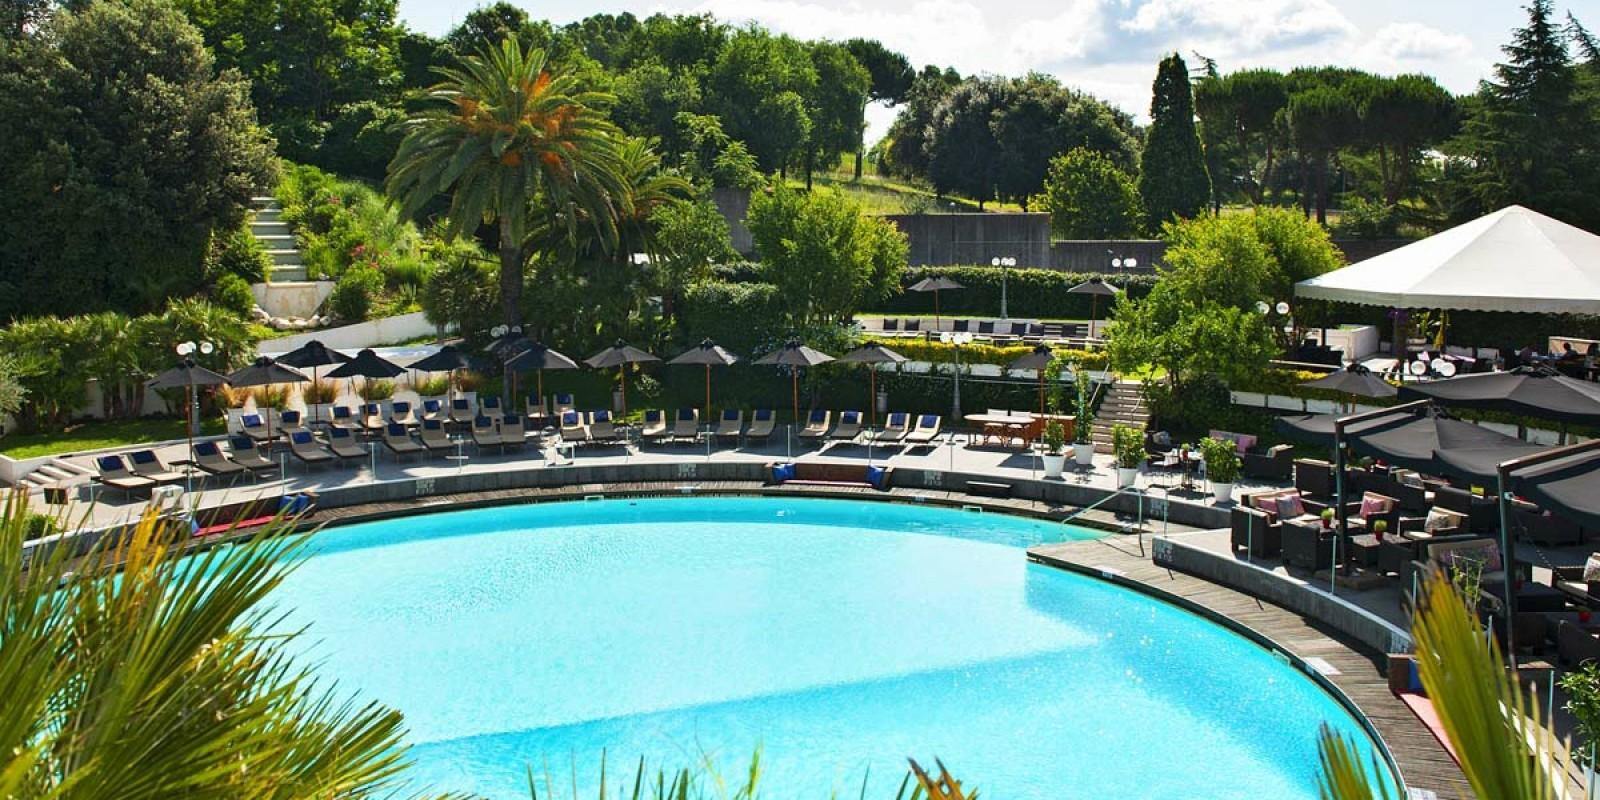 Ricerca Hotel Roma